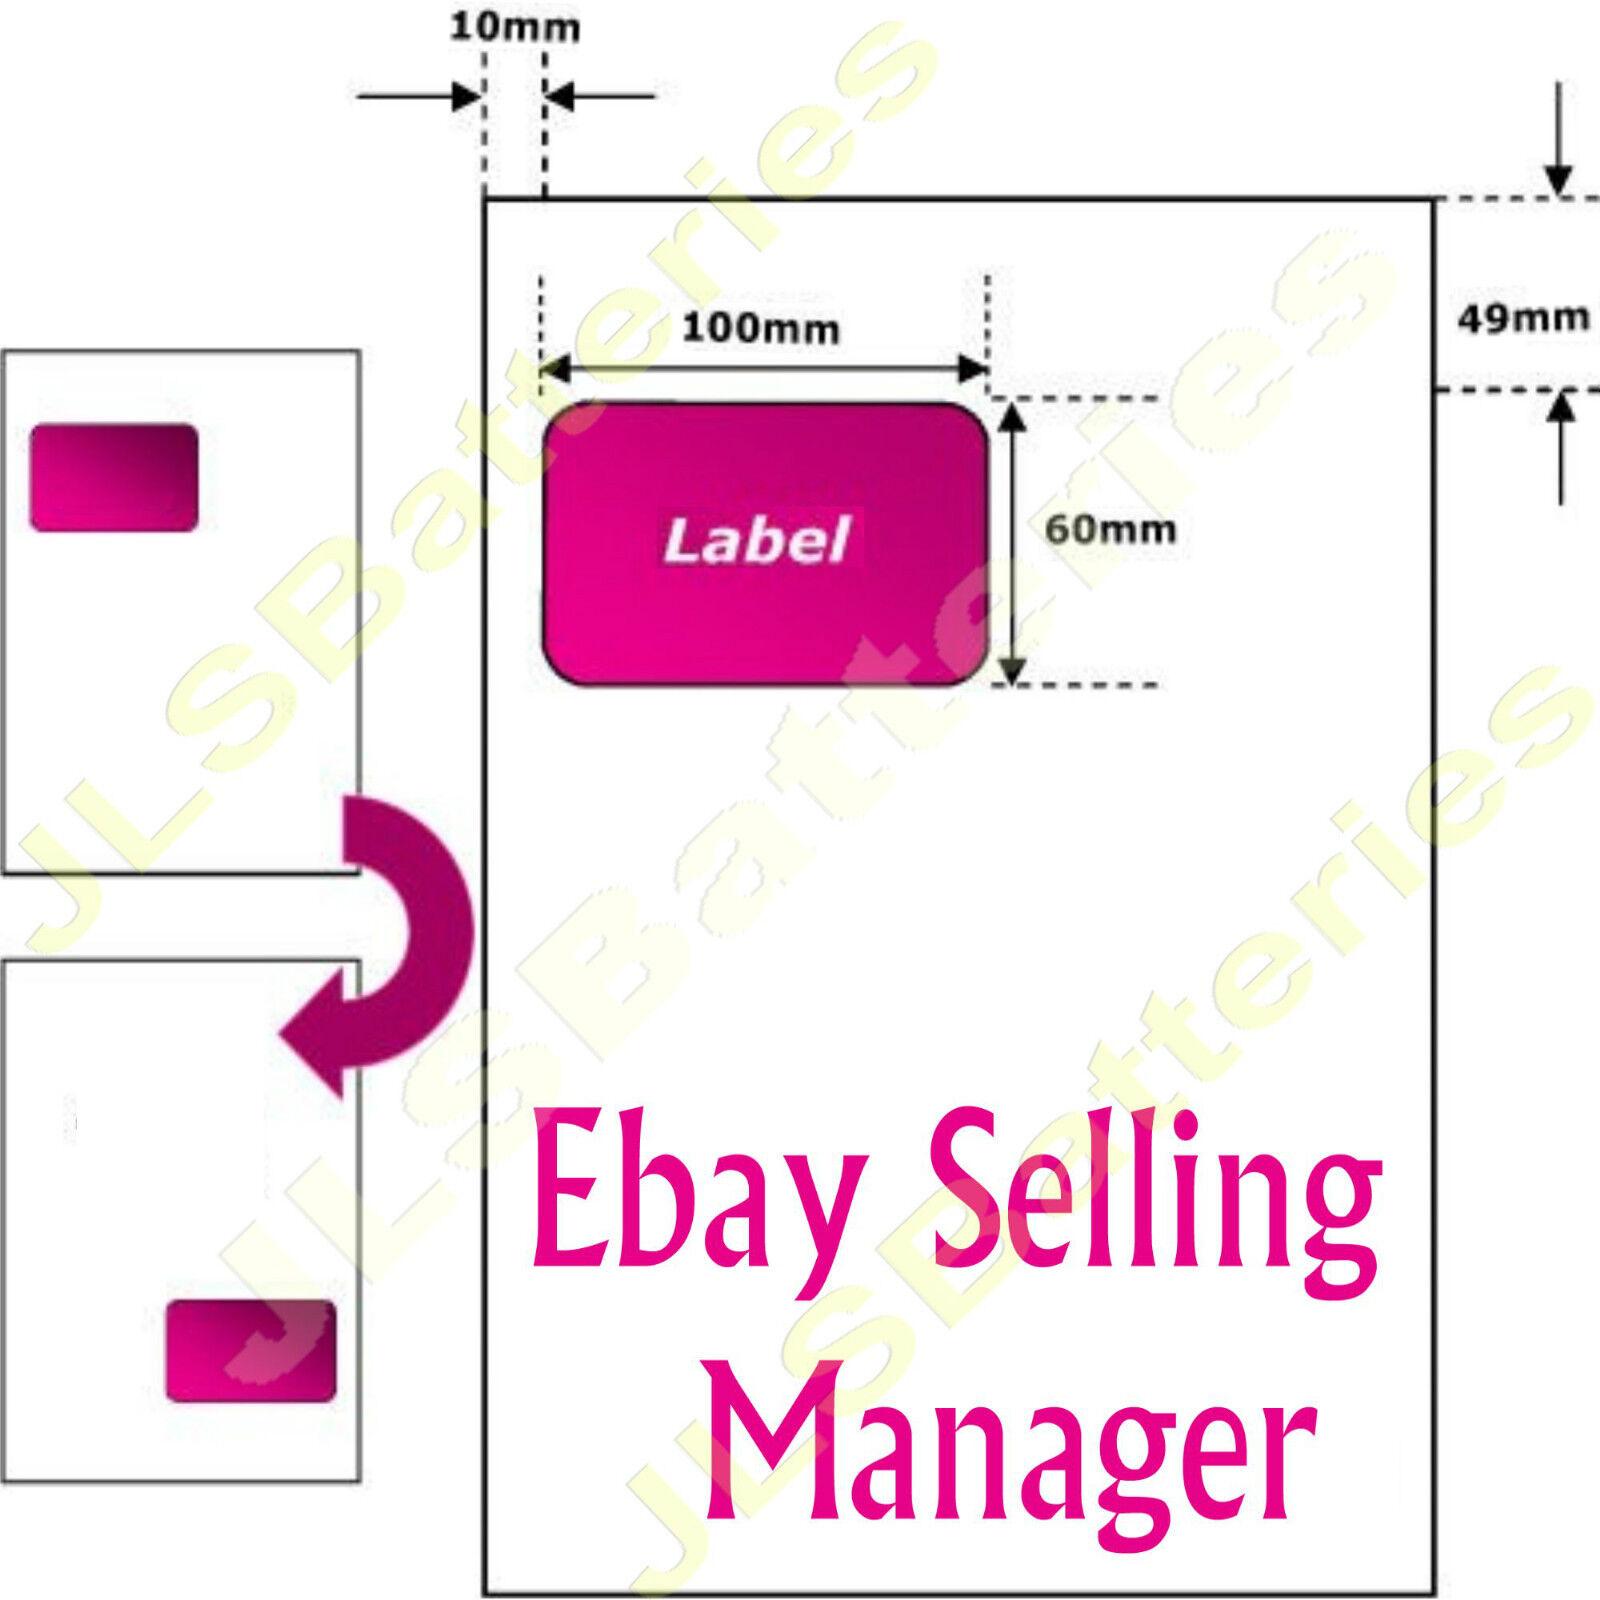 A4 Facture Ebay Adresse 110 étiquettes papier Intergrated SMP emballage 110 Adresse mm x 60 mm 0761fe